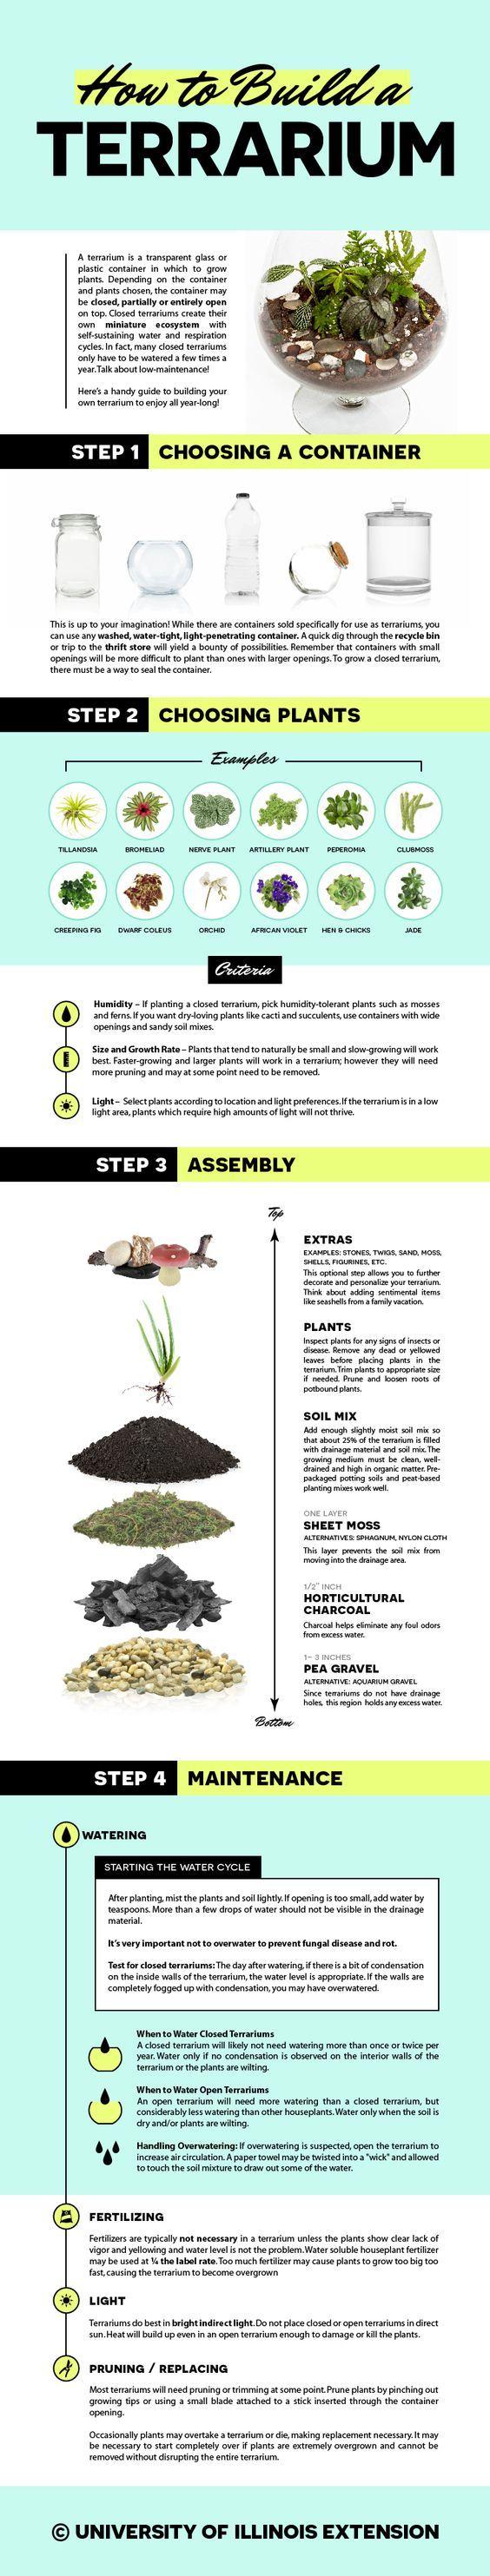 How to build a terrarium u fun kidfriendly diy garden project not